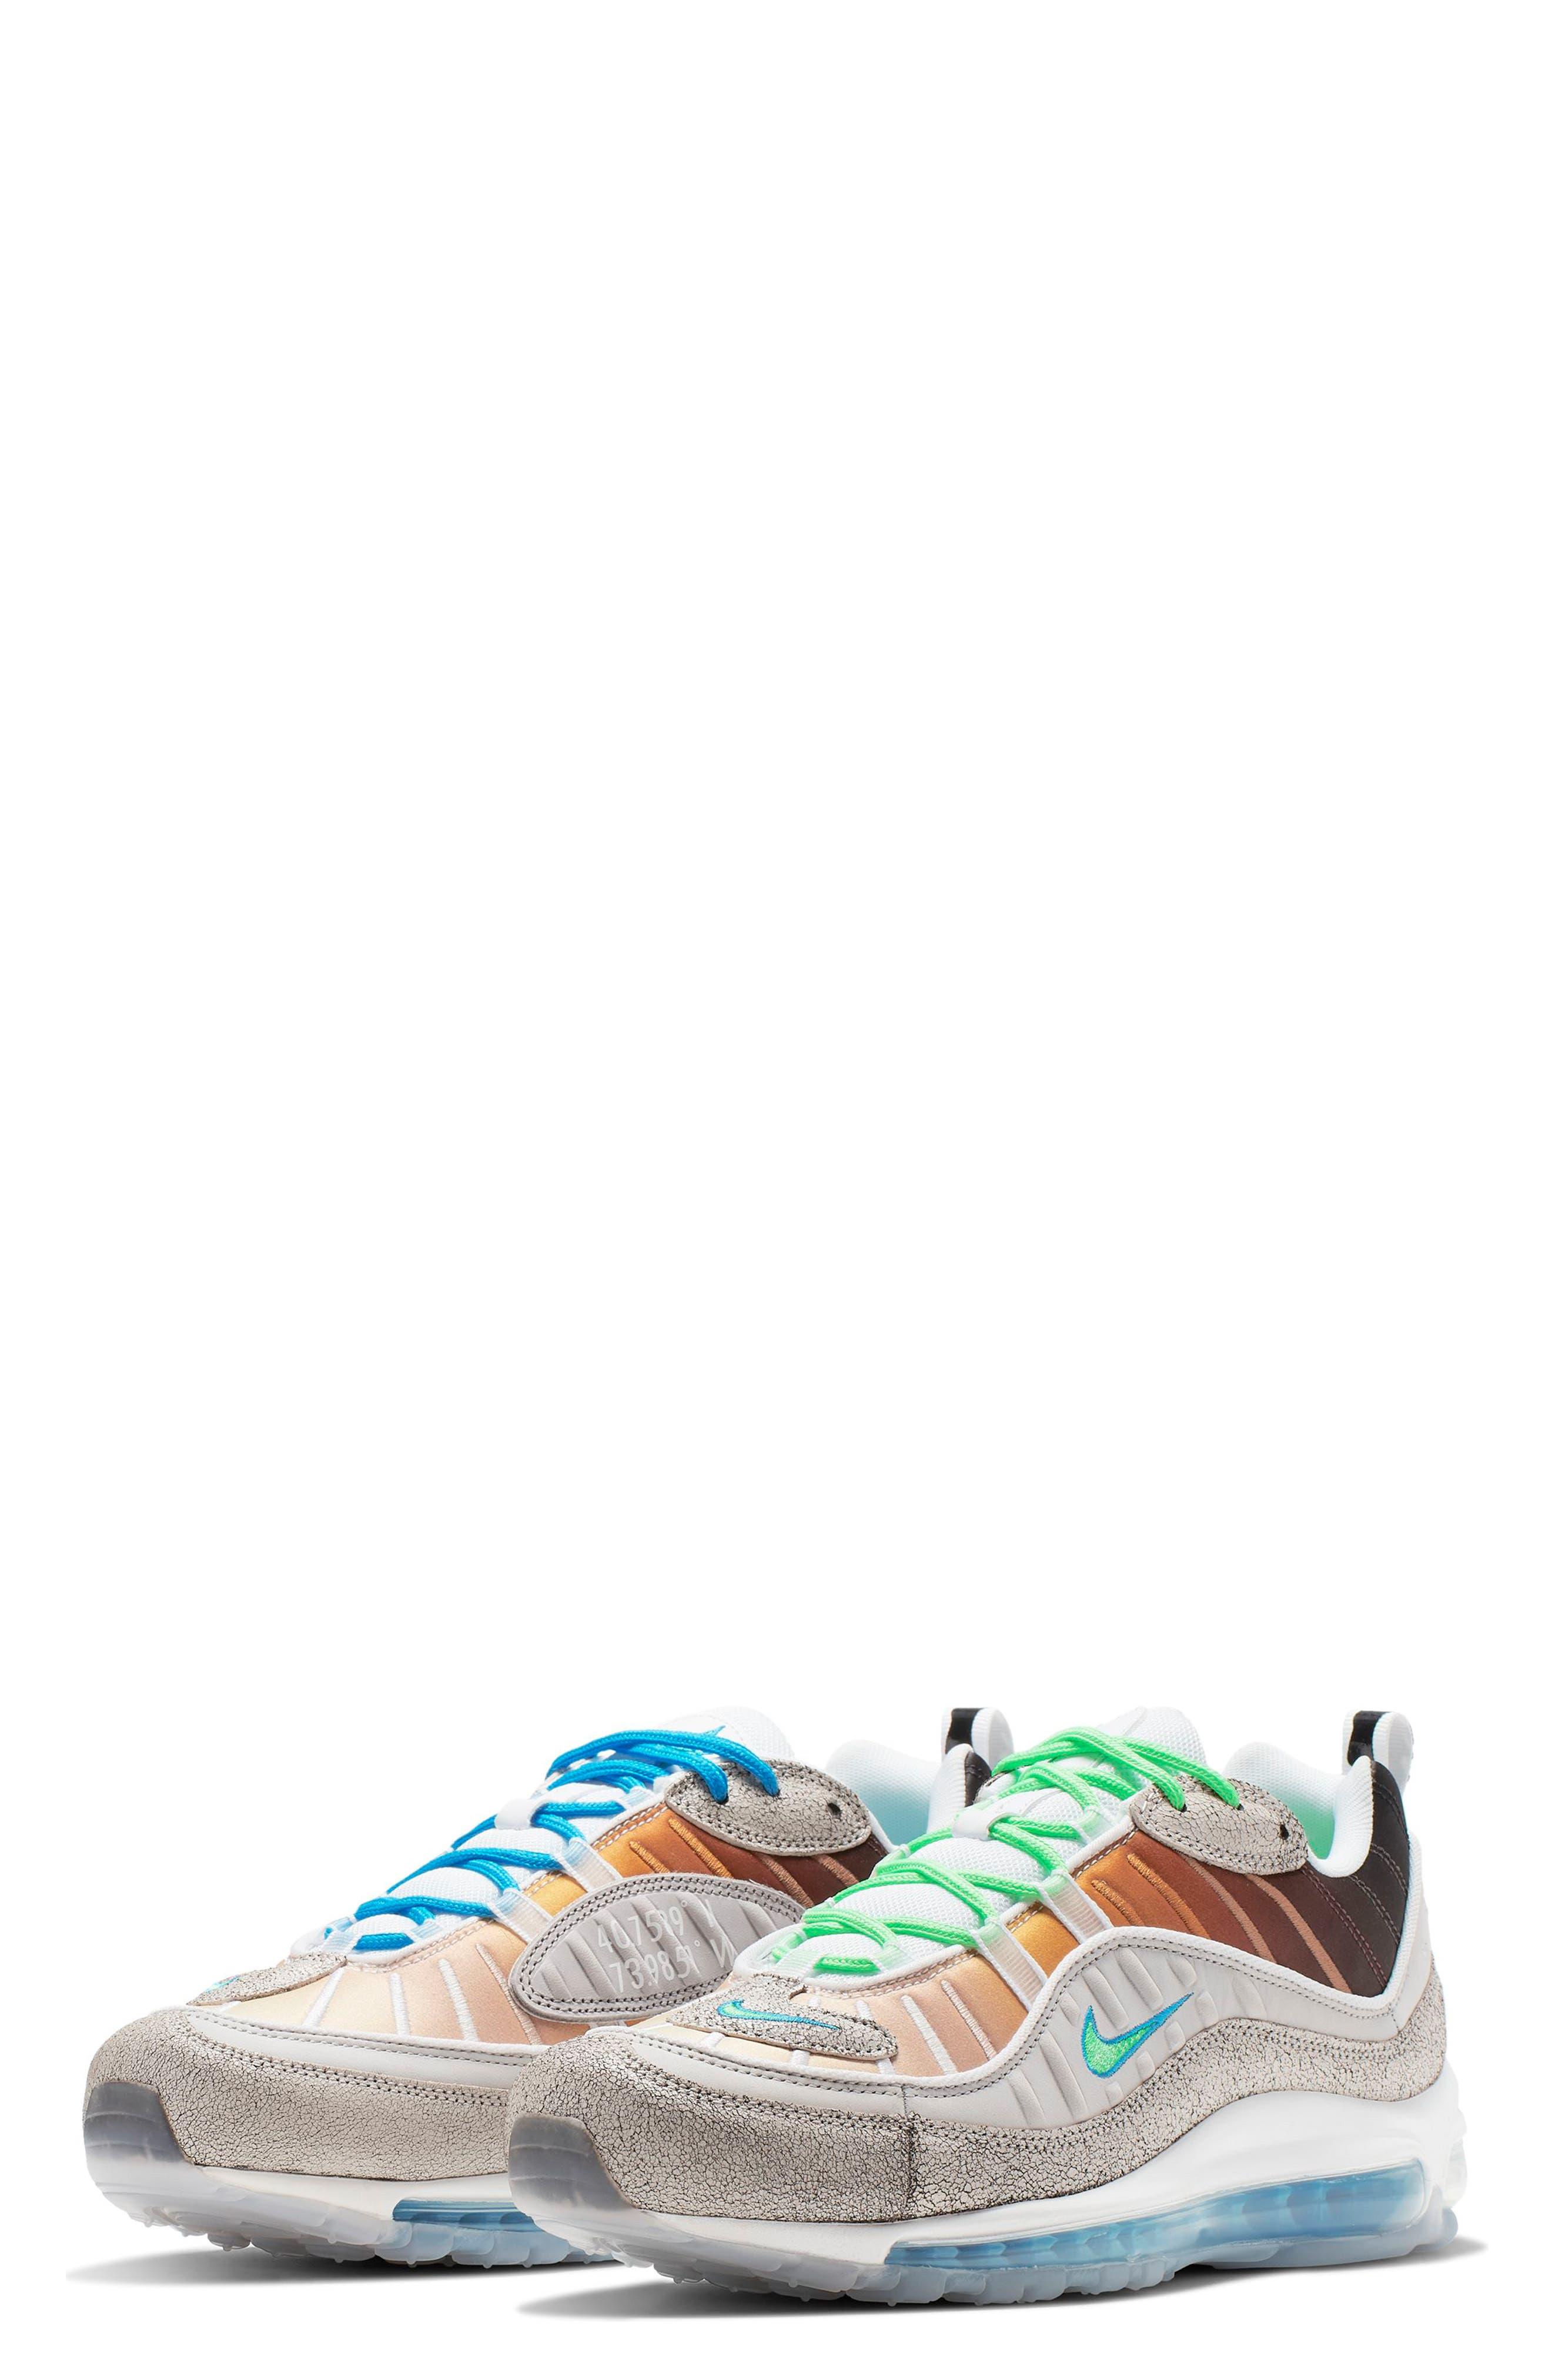 Men's Nike Shoes | Nordstrom